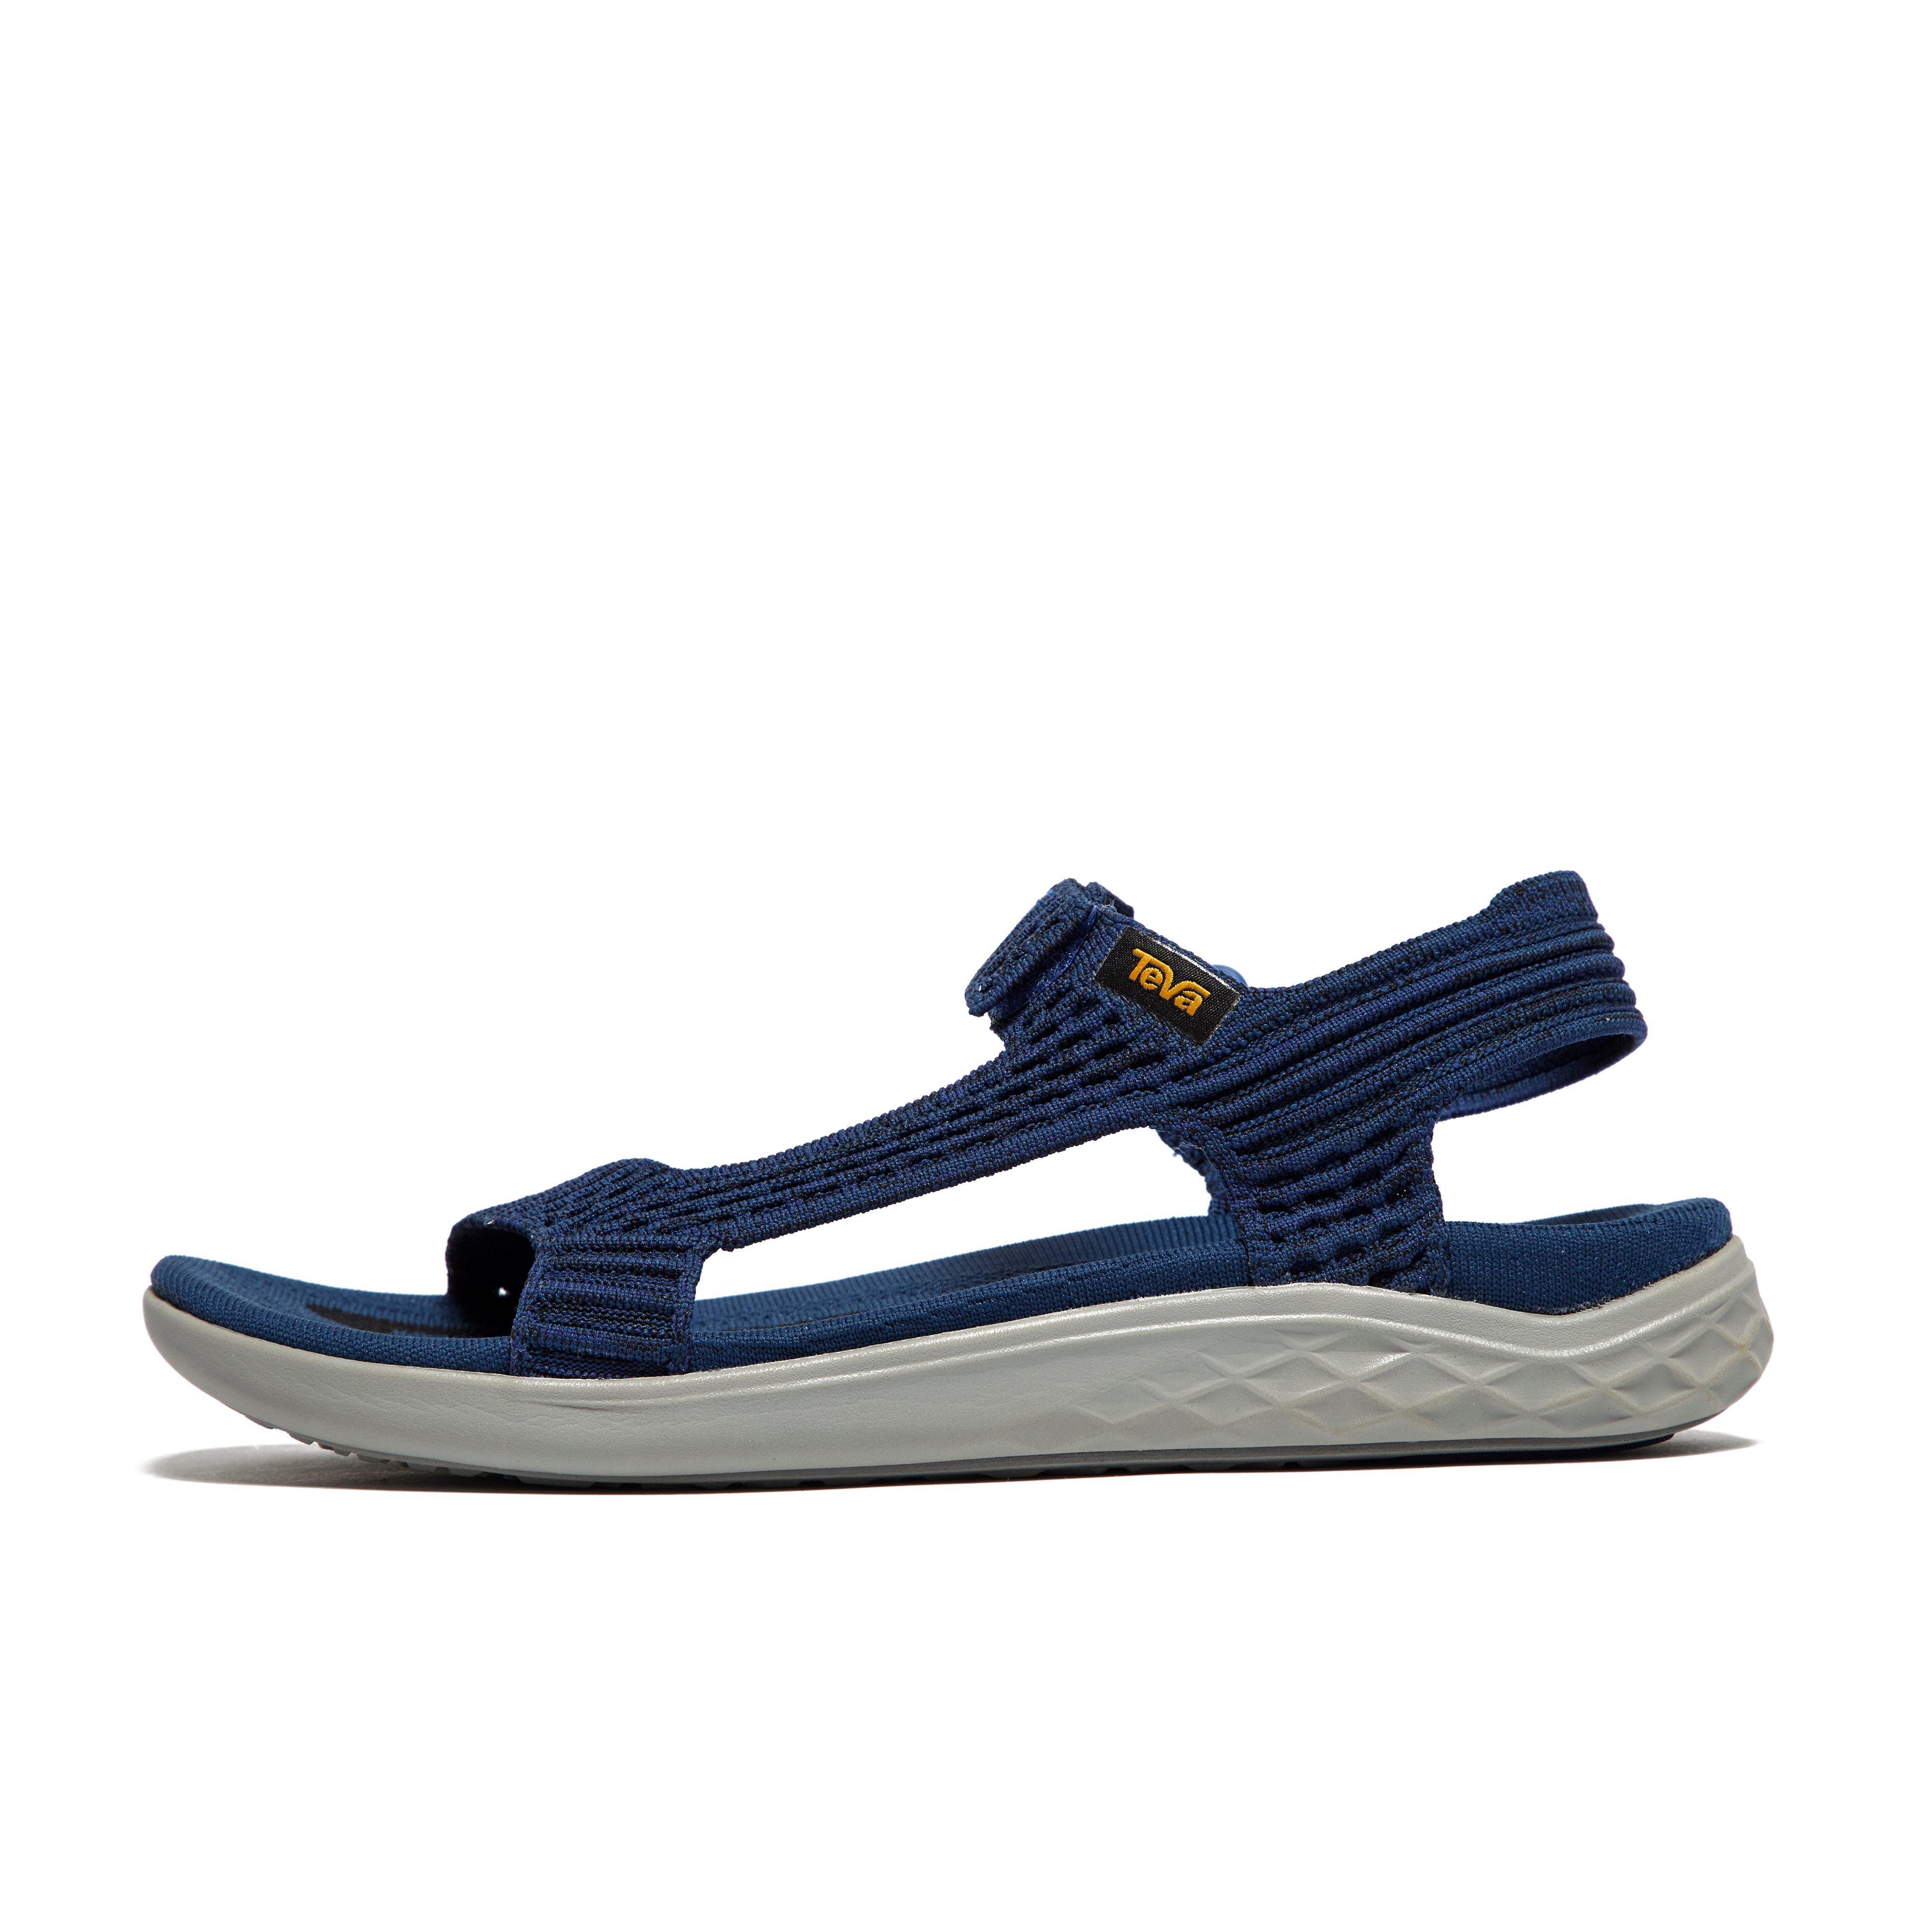 046f4a304023da Details about New Teva Terra-Float 2 Knit Universal Men's Walking Sandals